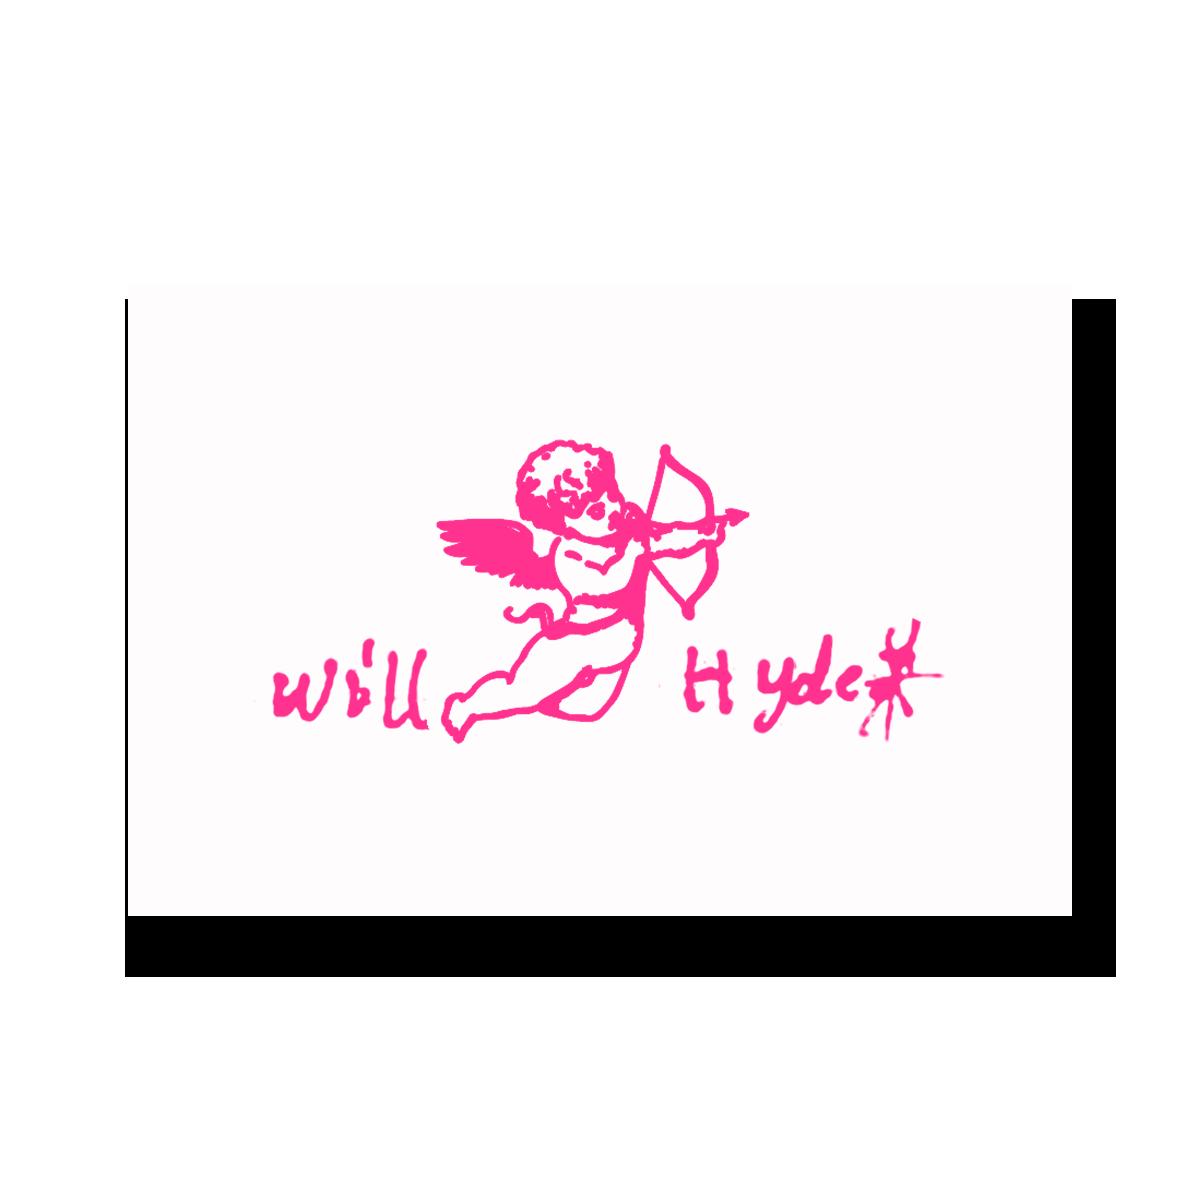 Will Hyde Temporary Tattoo